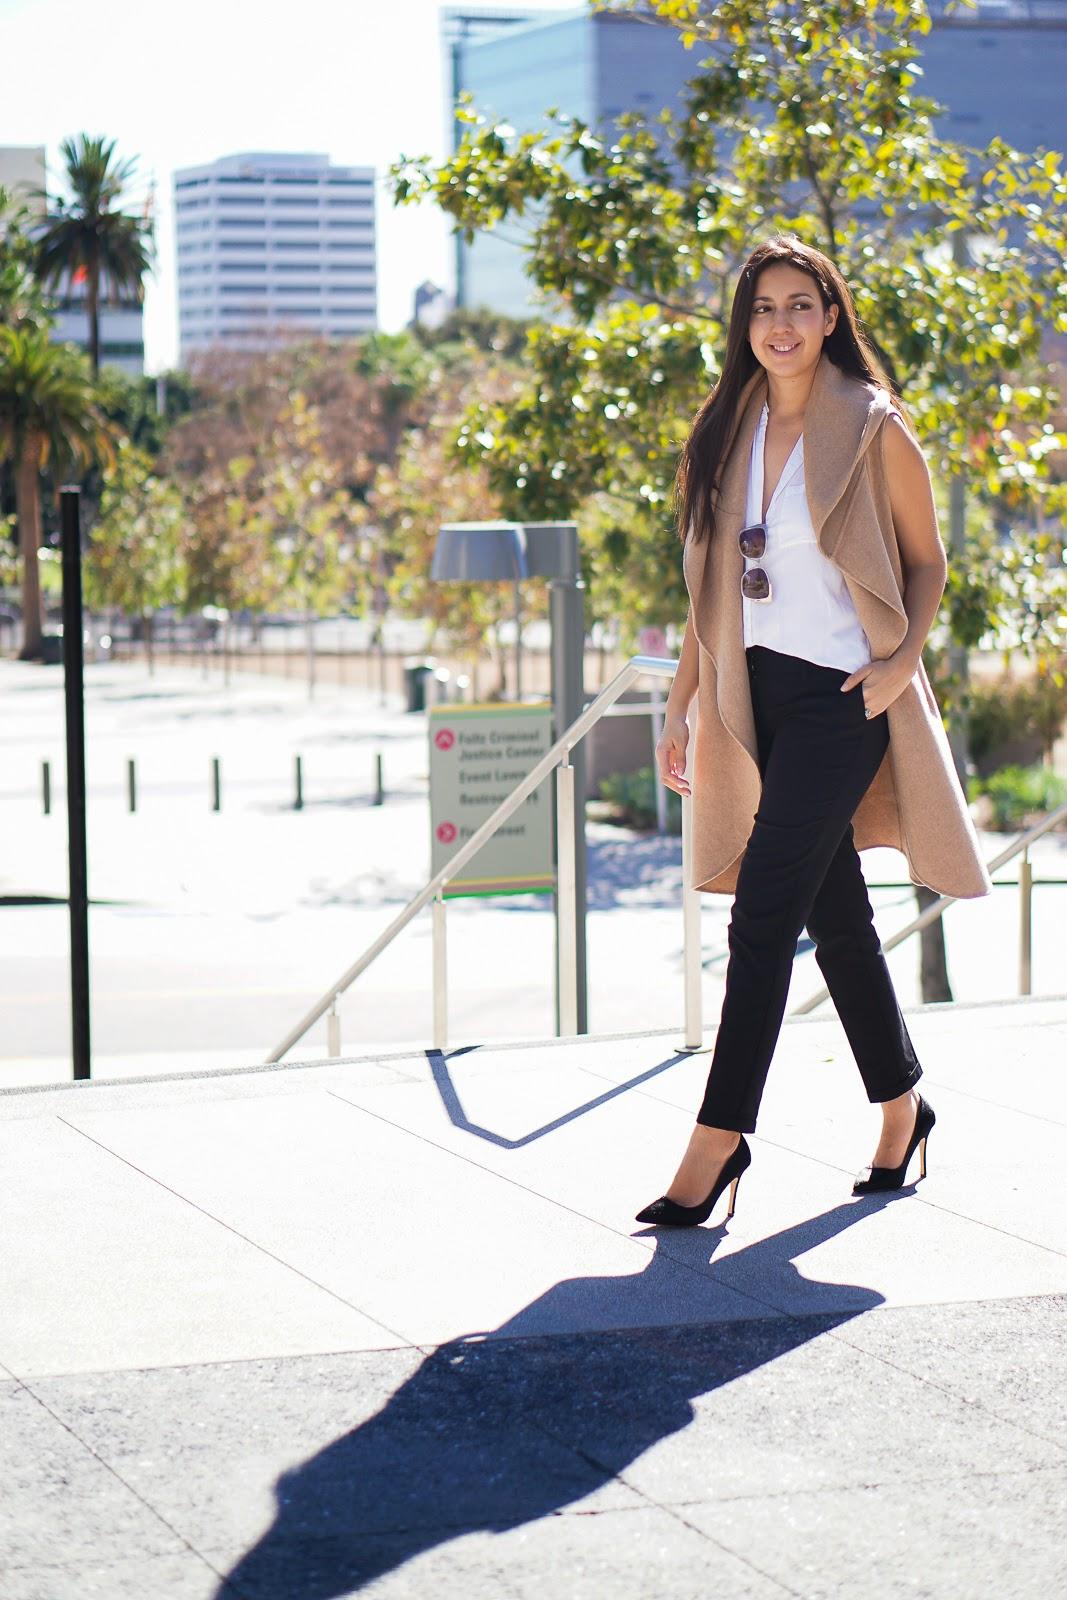 Lookbook, Zara Camel Vest, Camel Vest, Zara Vest, Shoemint Heels, Black Heels, Black Pumps, Aldo Bag, Zara Hand Made Long Waistcoat, Zara Camel Waist Coat, How to Style a Camel Vest, LA Fashion Blogger, Latina Fashion Blogger